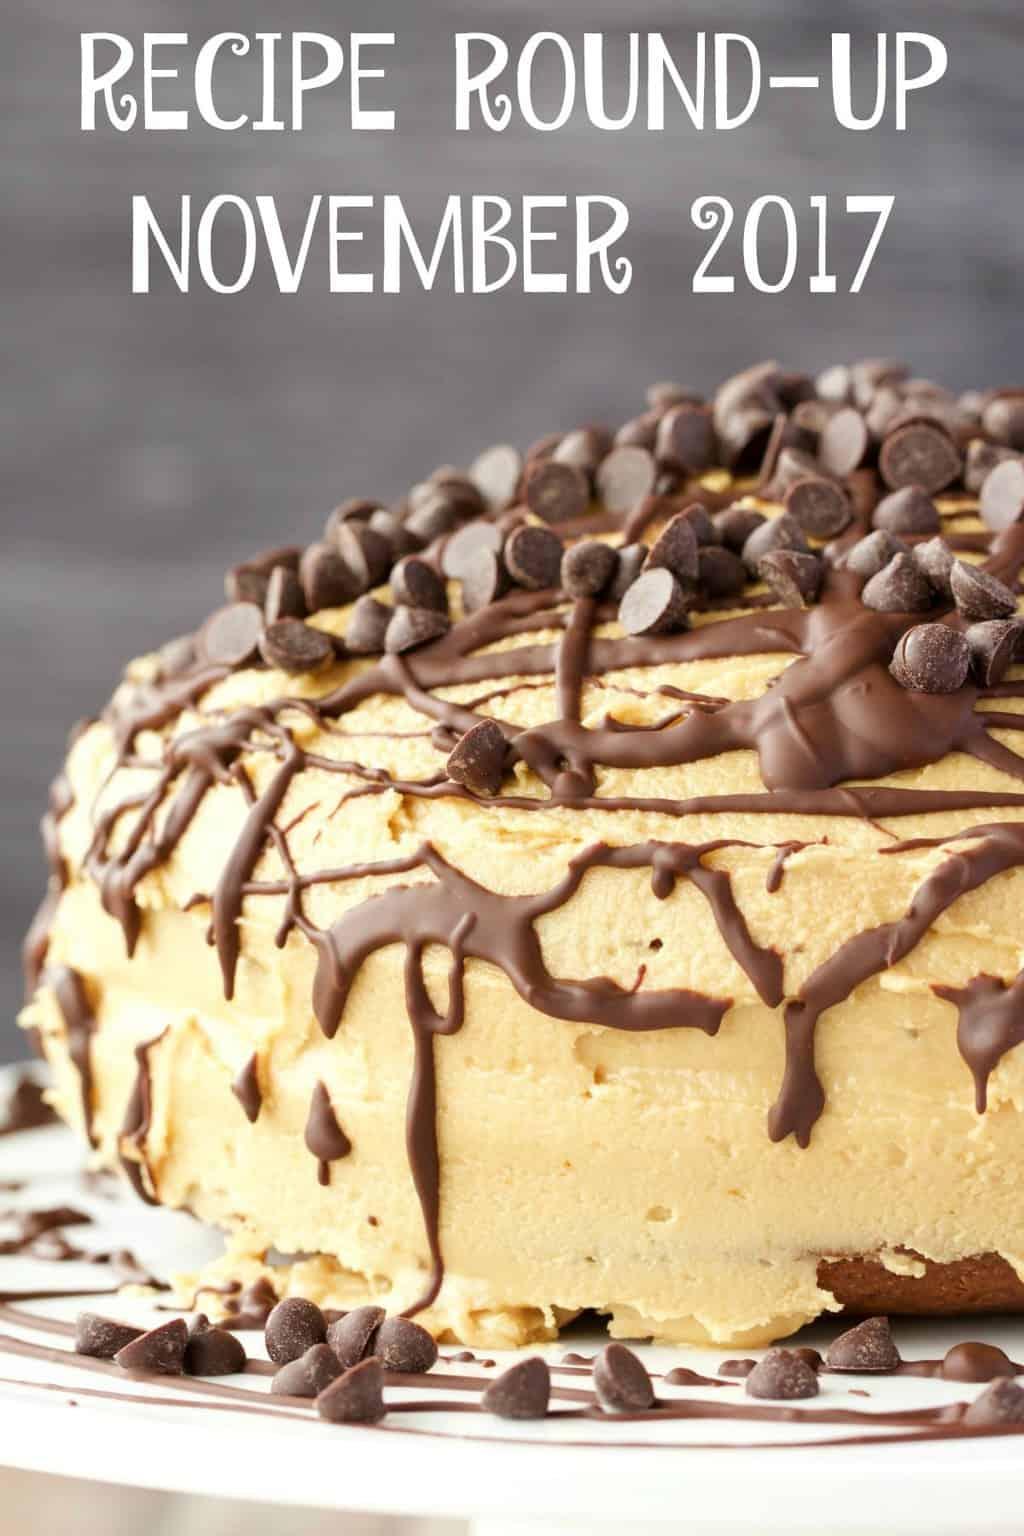 Recipe Round Up November 2017